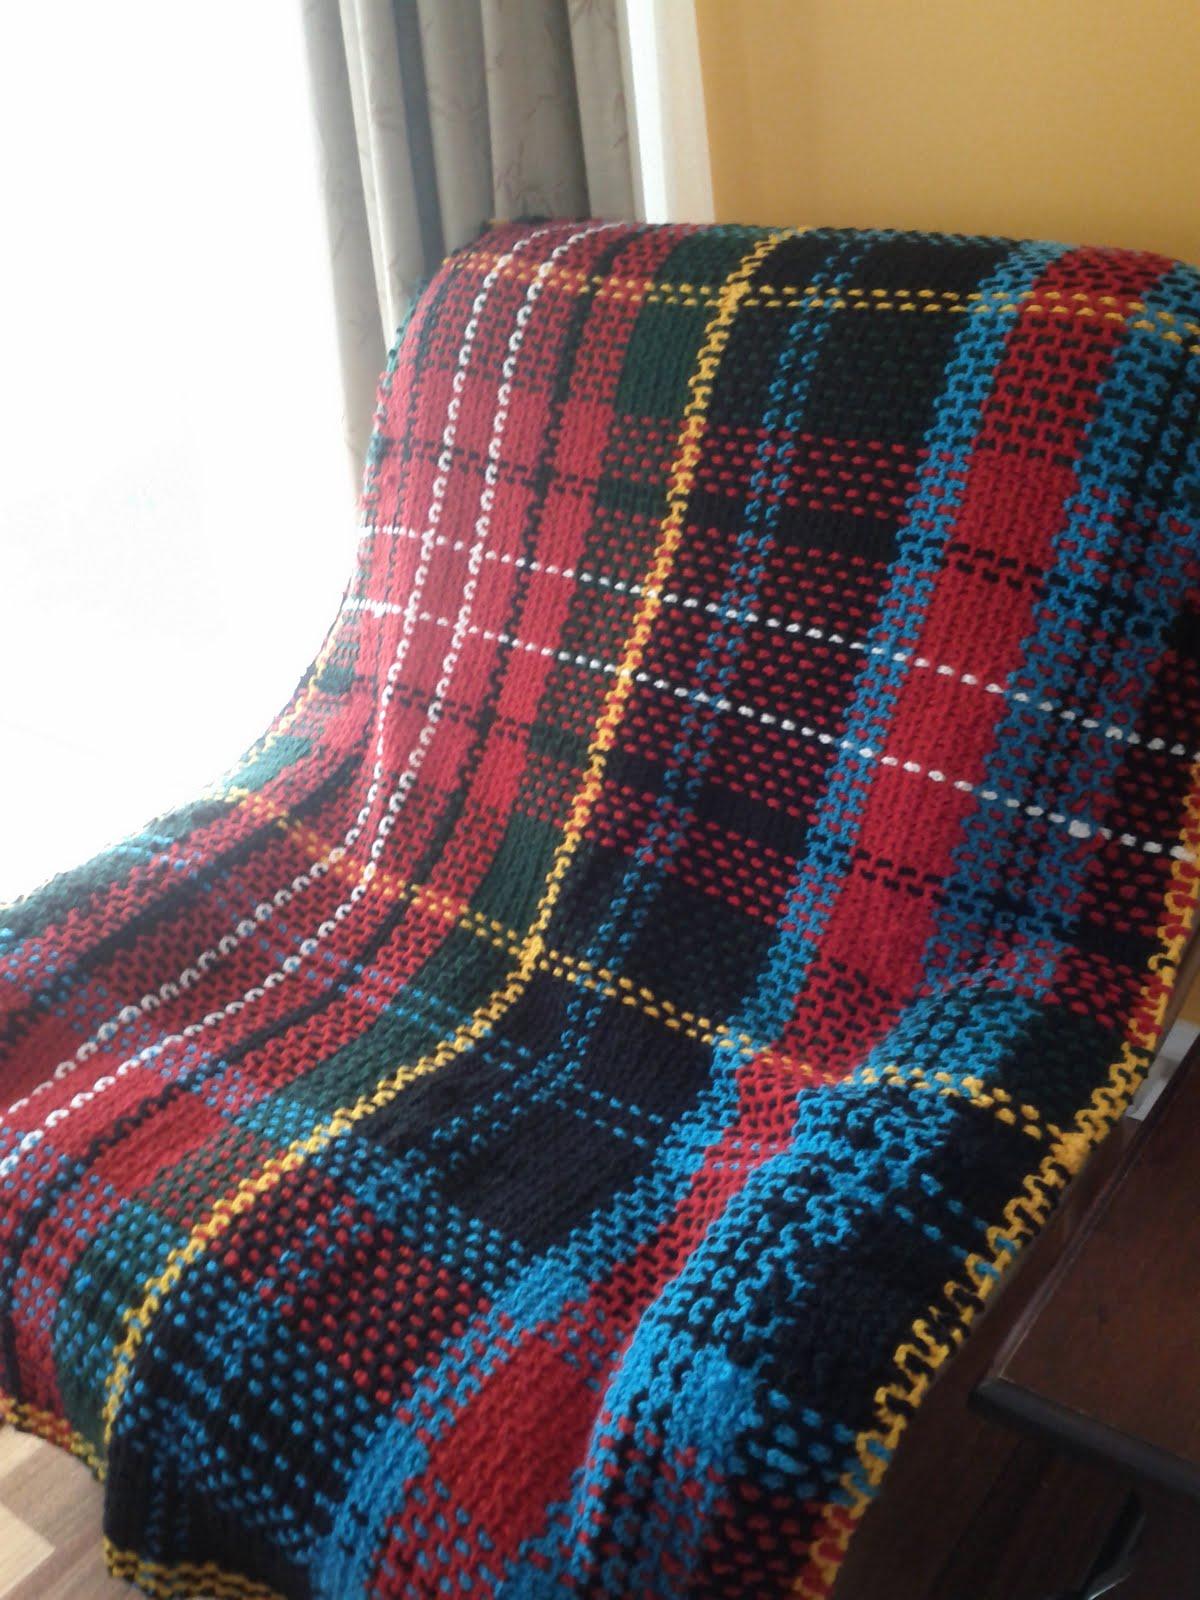 Free Crochet Patterns Tartan Rugs : Lacy froth: 15 Caledonian Tartan rug